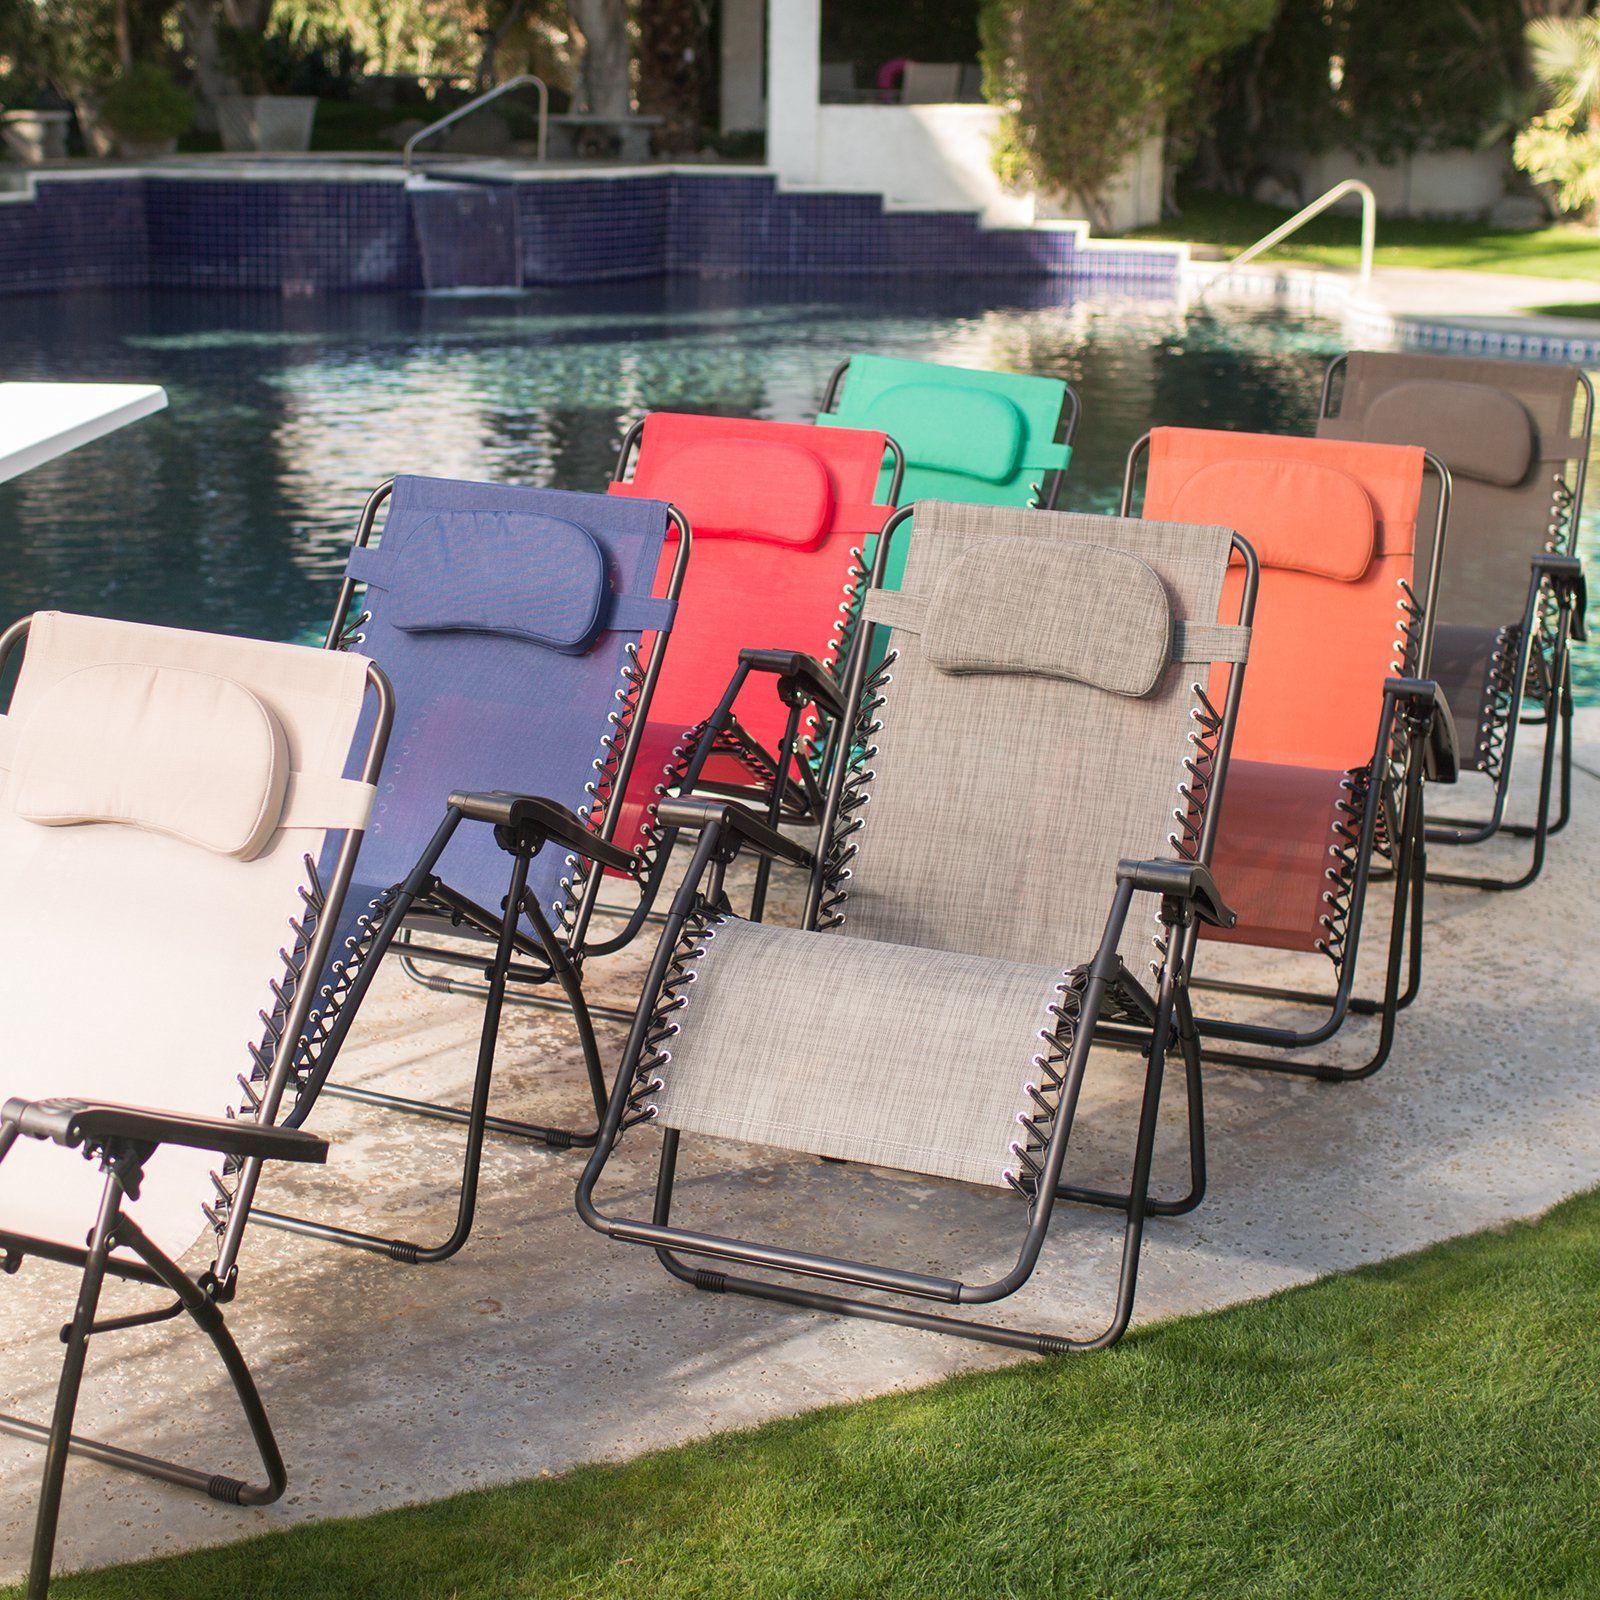 fresh attachment s sales tar luxury patio luxurios best furniture amazing luxuri sets of wicker sale seating